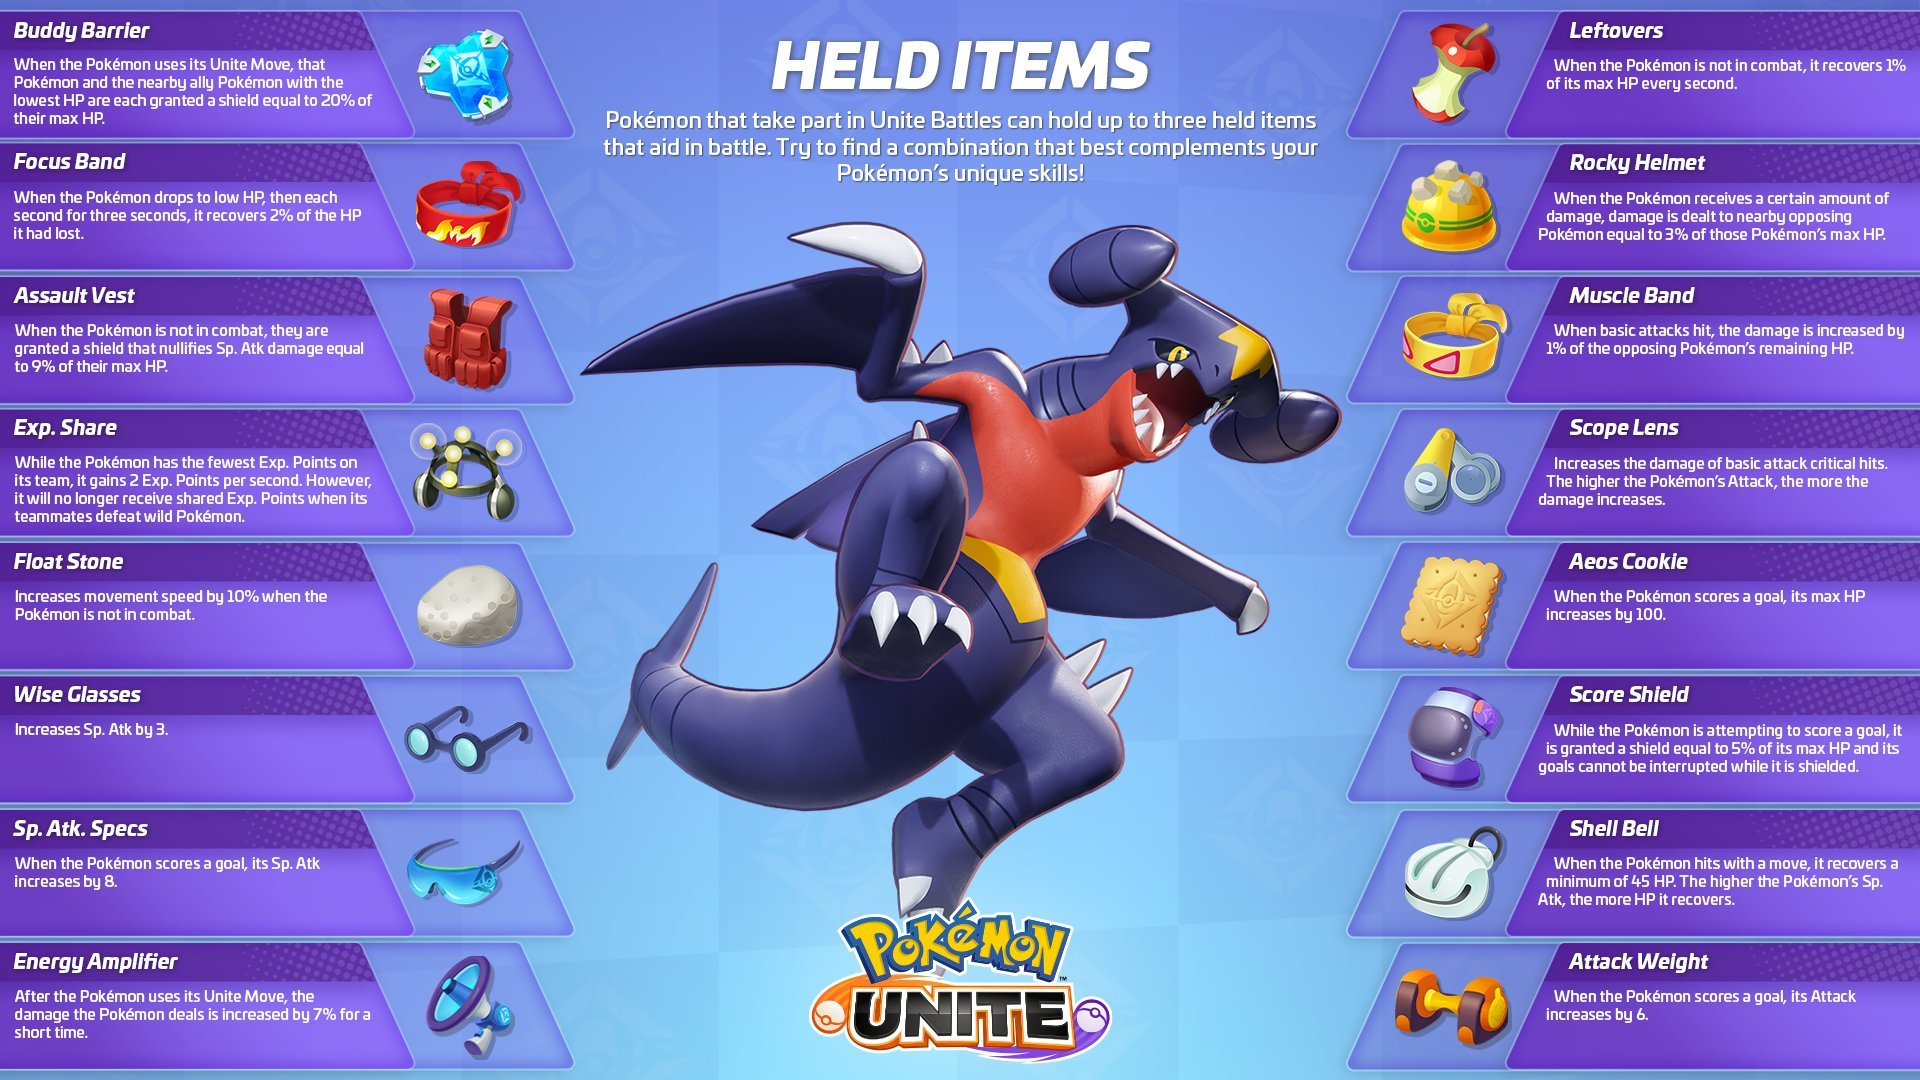 Pokemon unite items list all held items